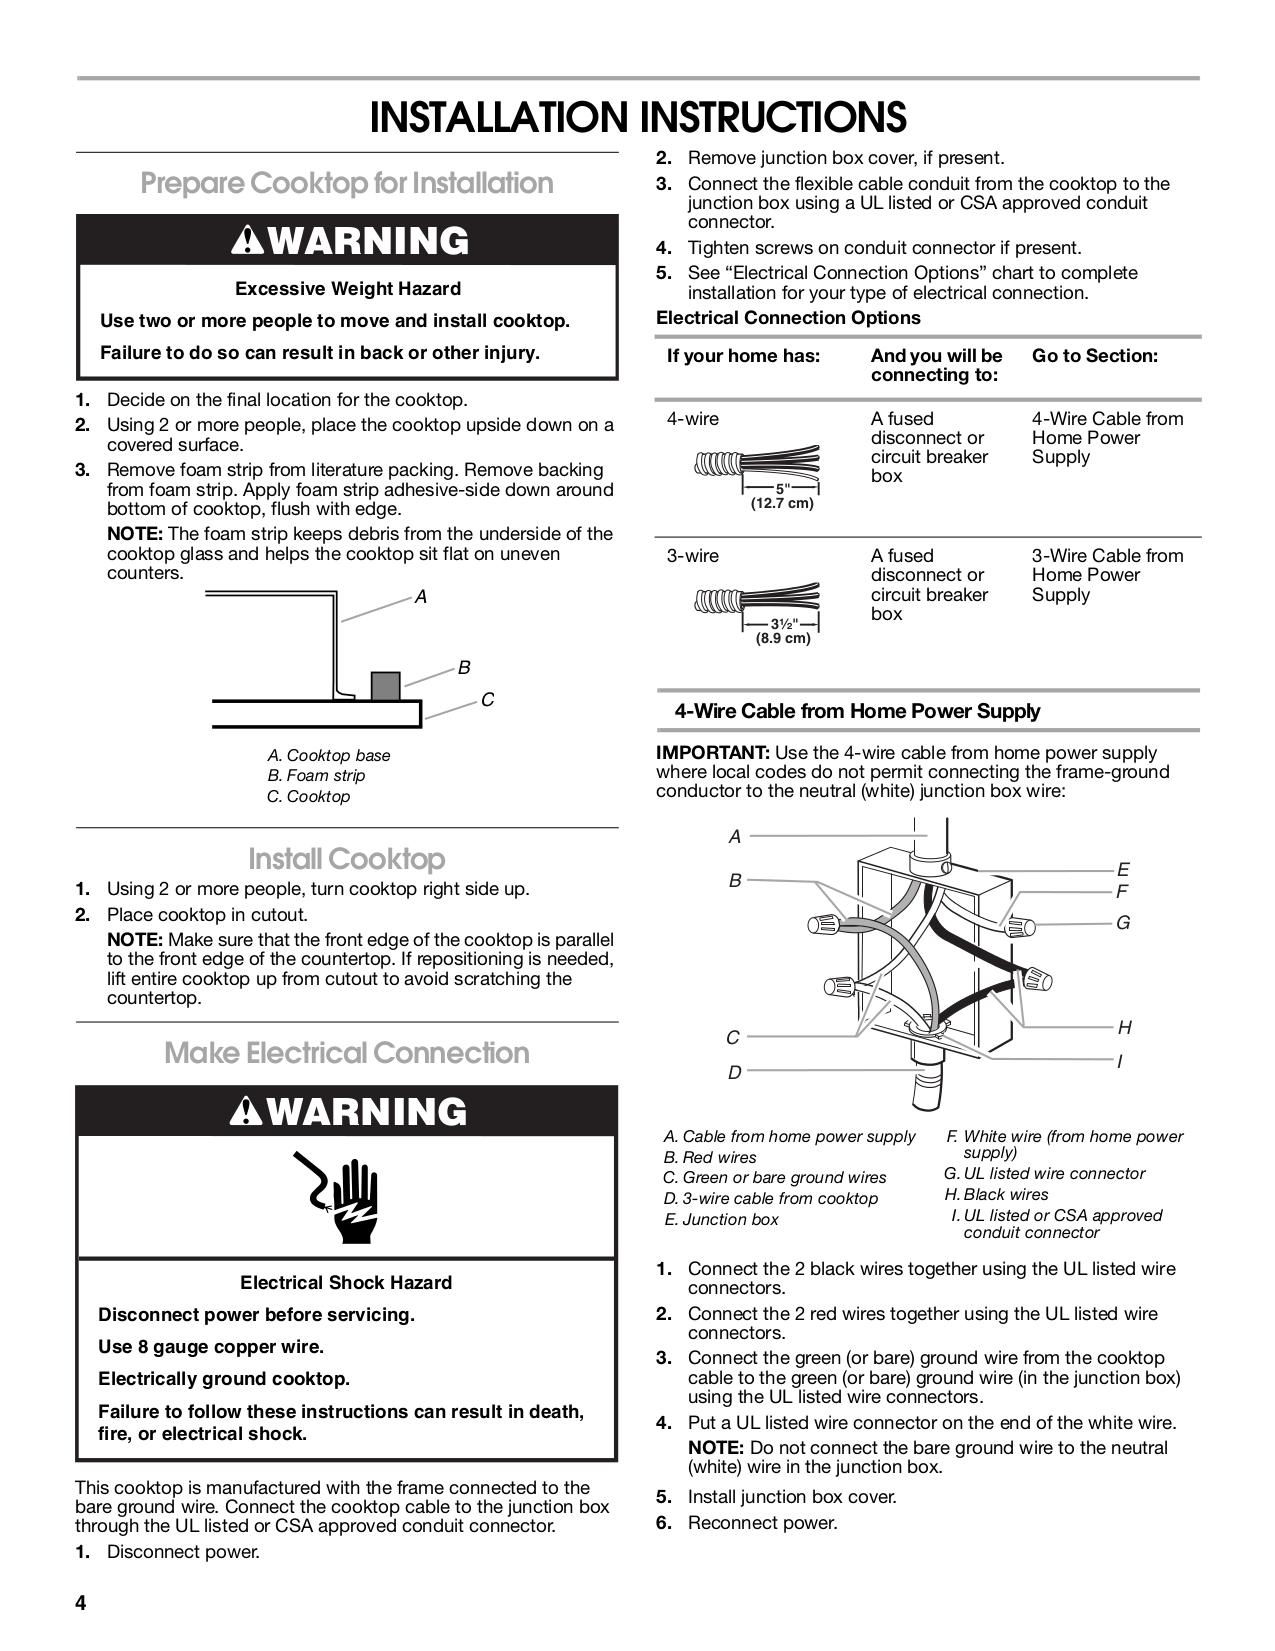 PDF manual for Maytag Range MEC7430WS